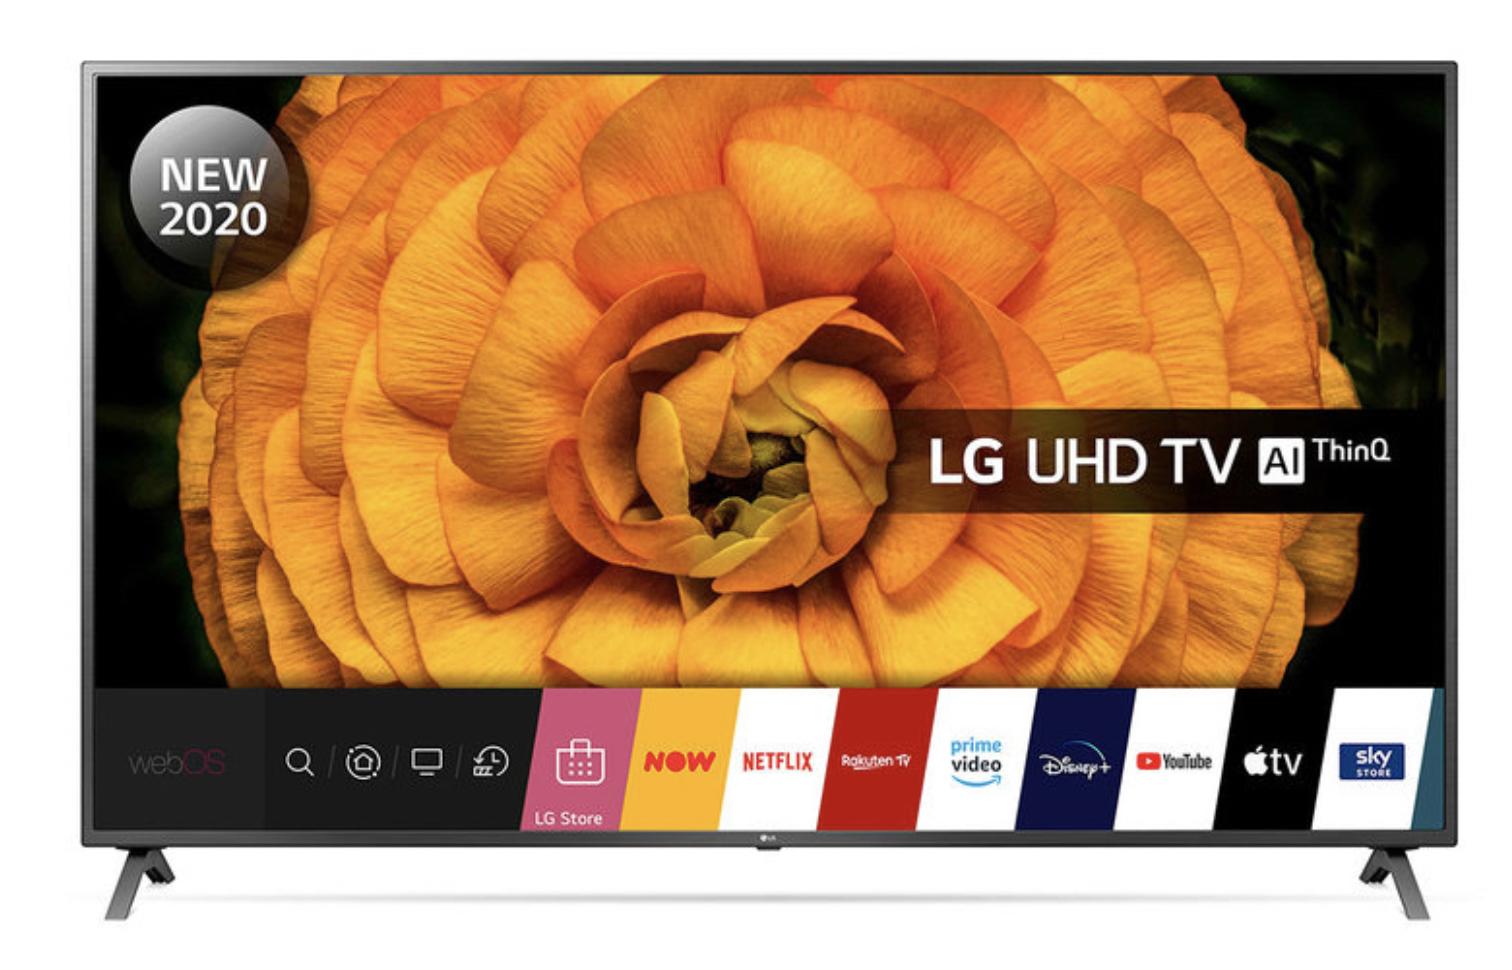 LG 82UN85006LA 82 Inch 4K Ultra HD Smart TV - £959.98 @ Costco (Glasgow)